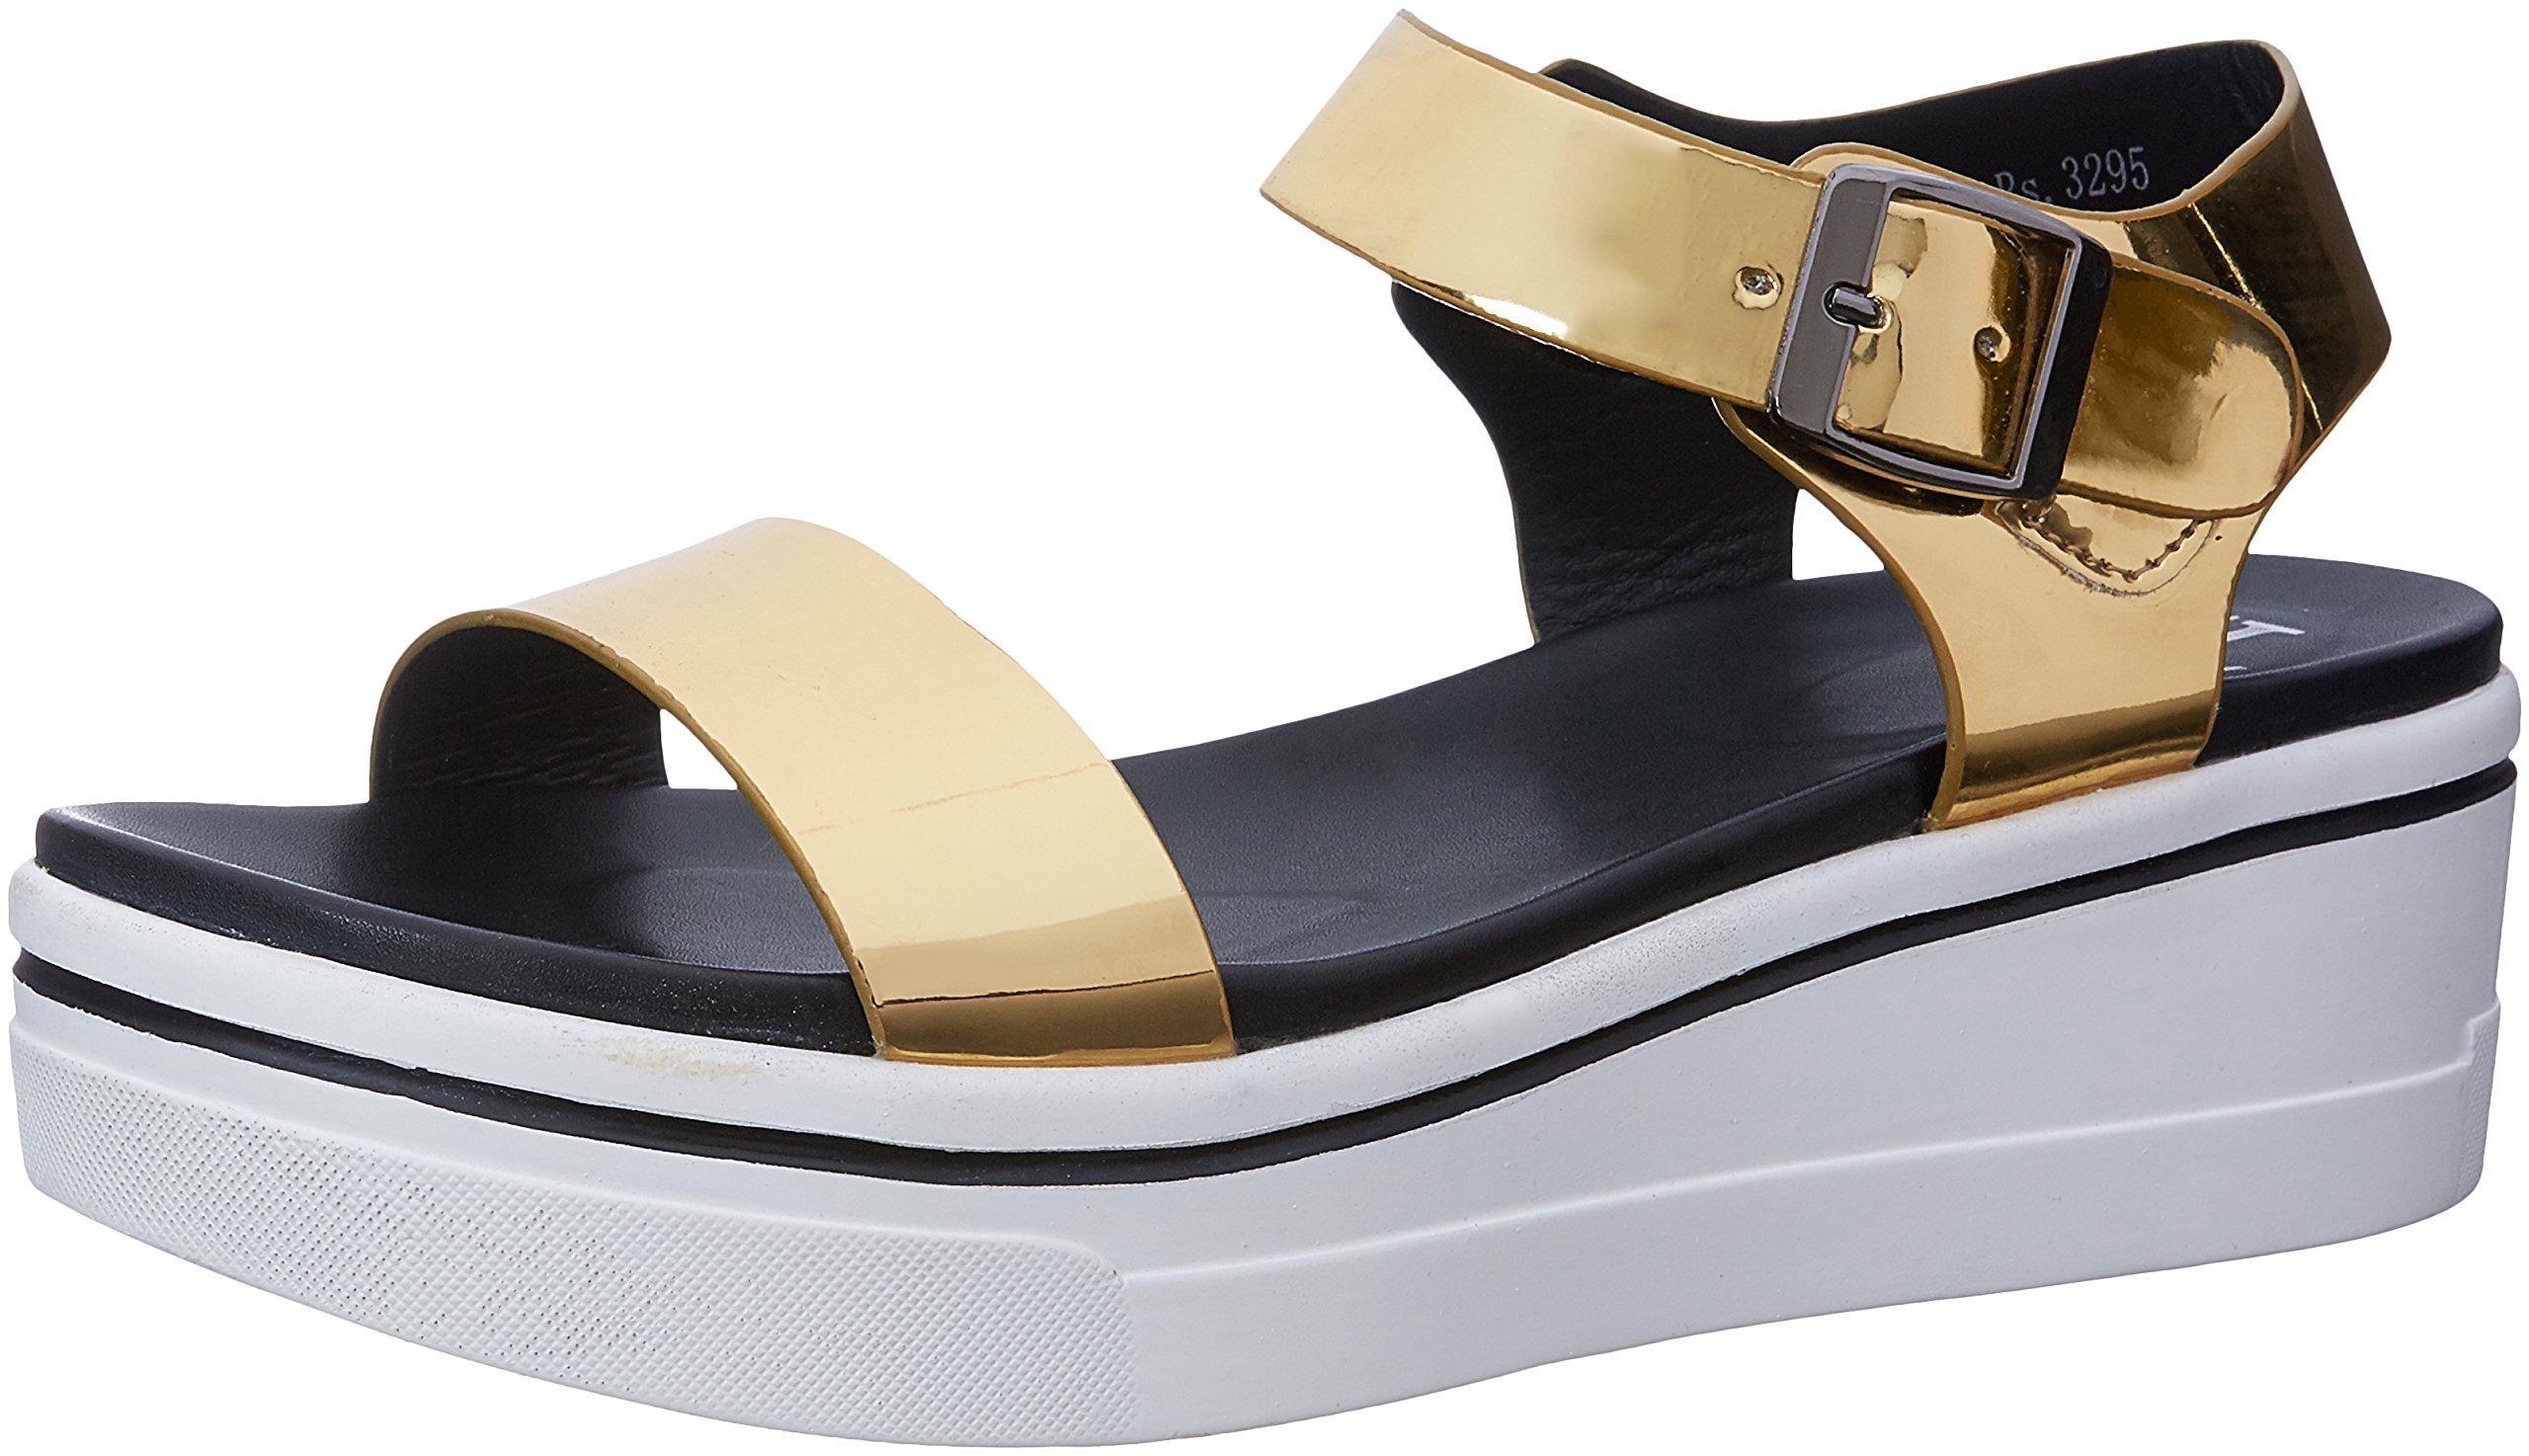 Carlton London Women's Peregrin Fashion Sandals